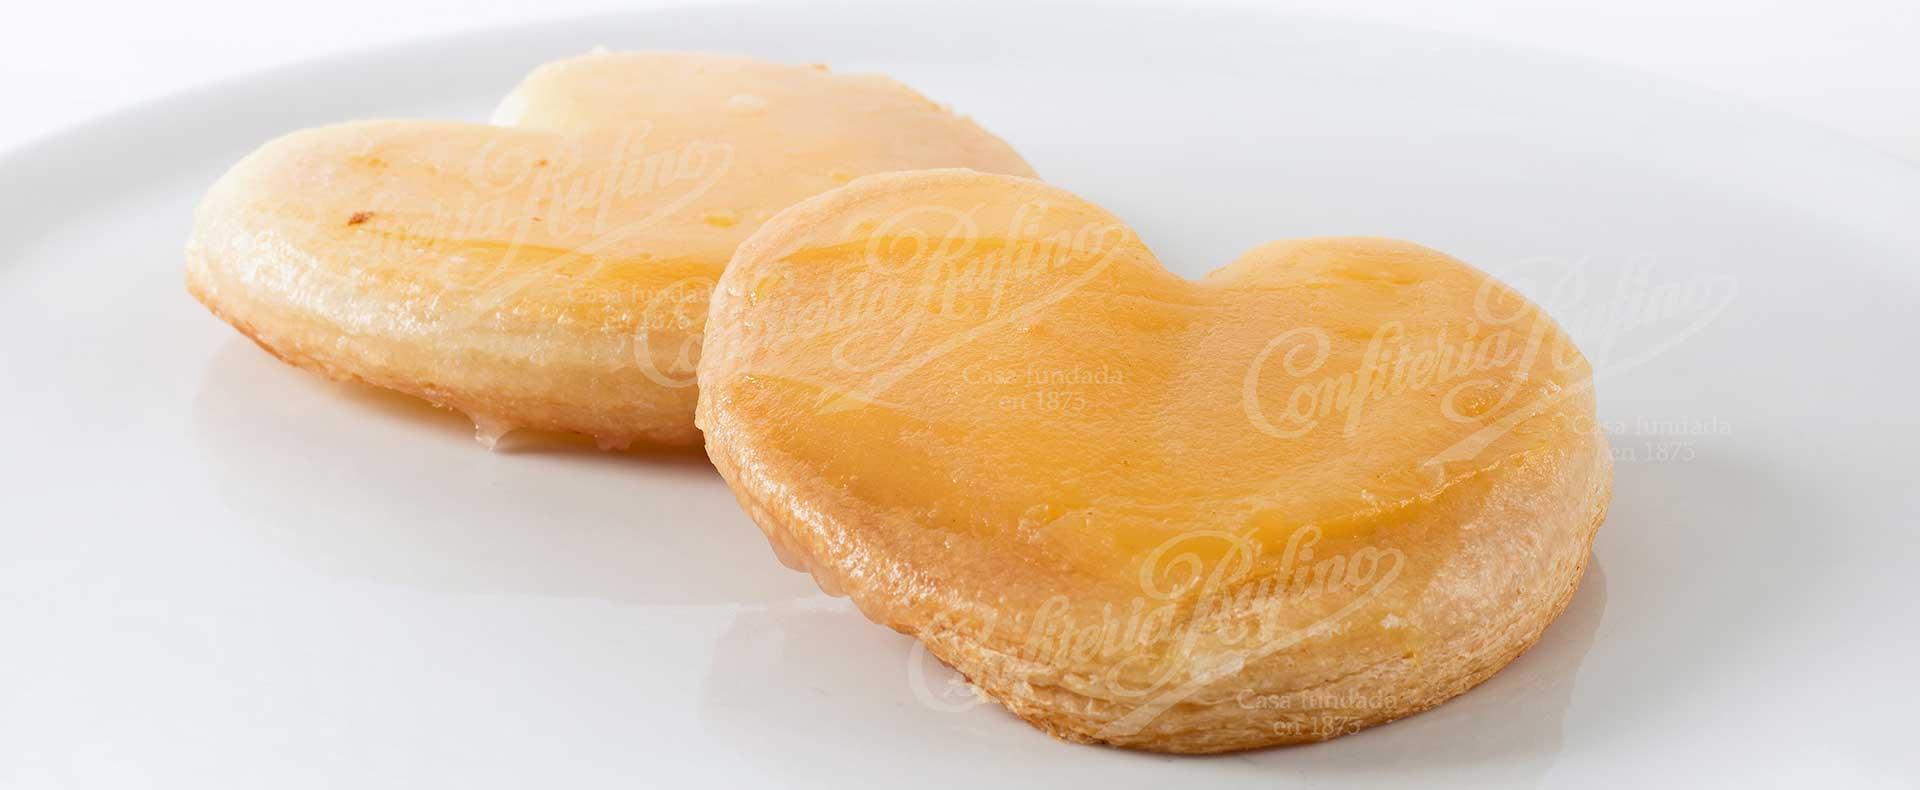 palmera de huevo crema artesana Confiteria Rufino Aracena